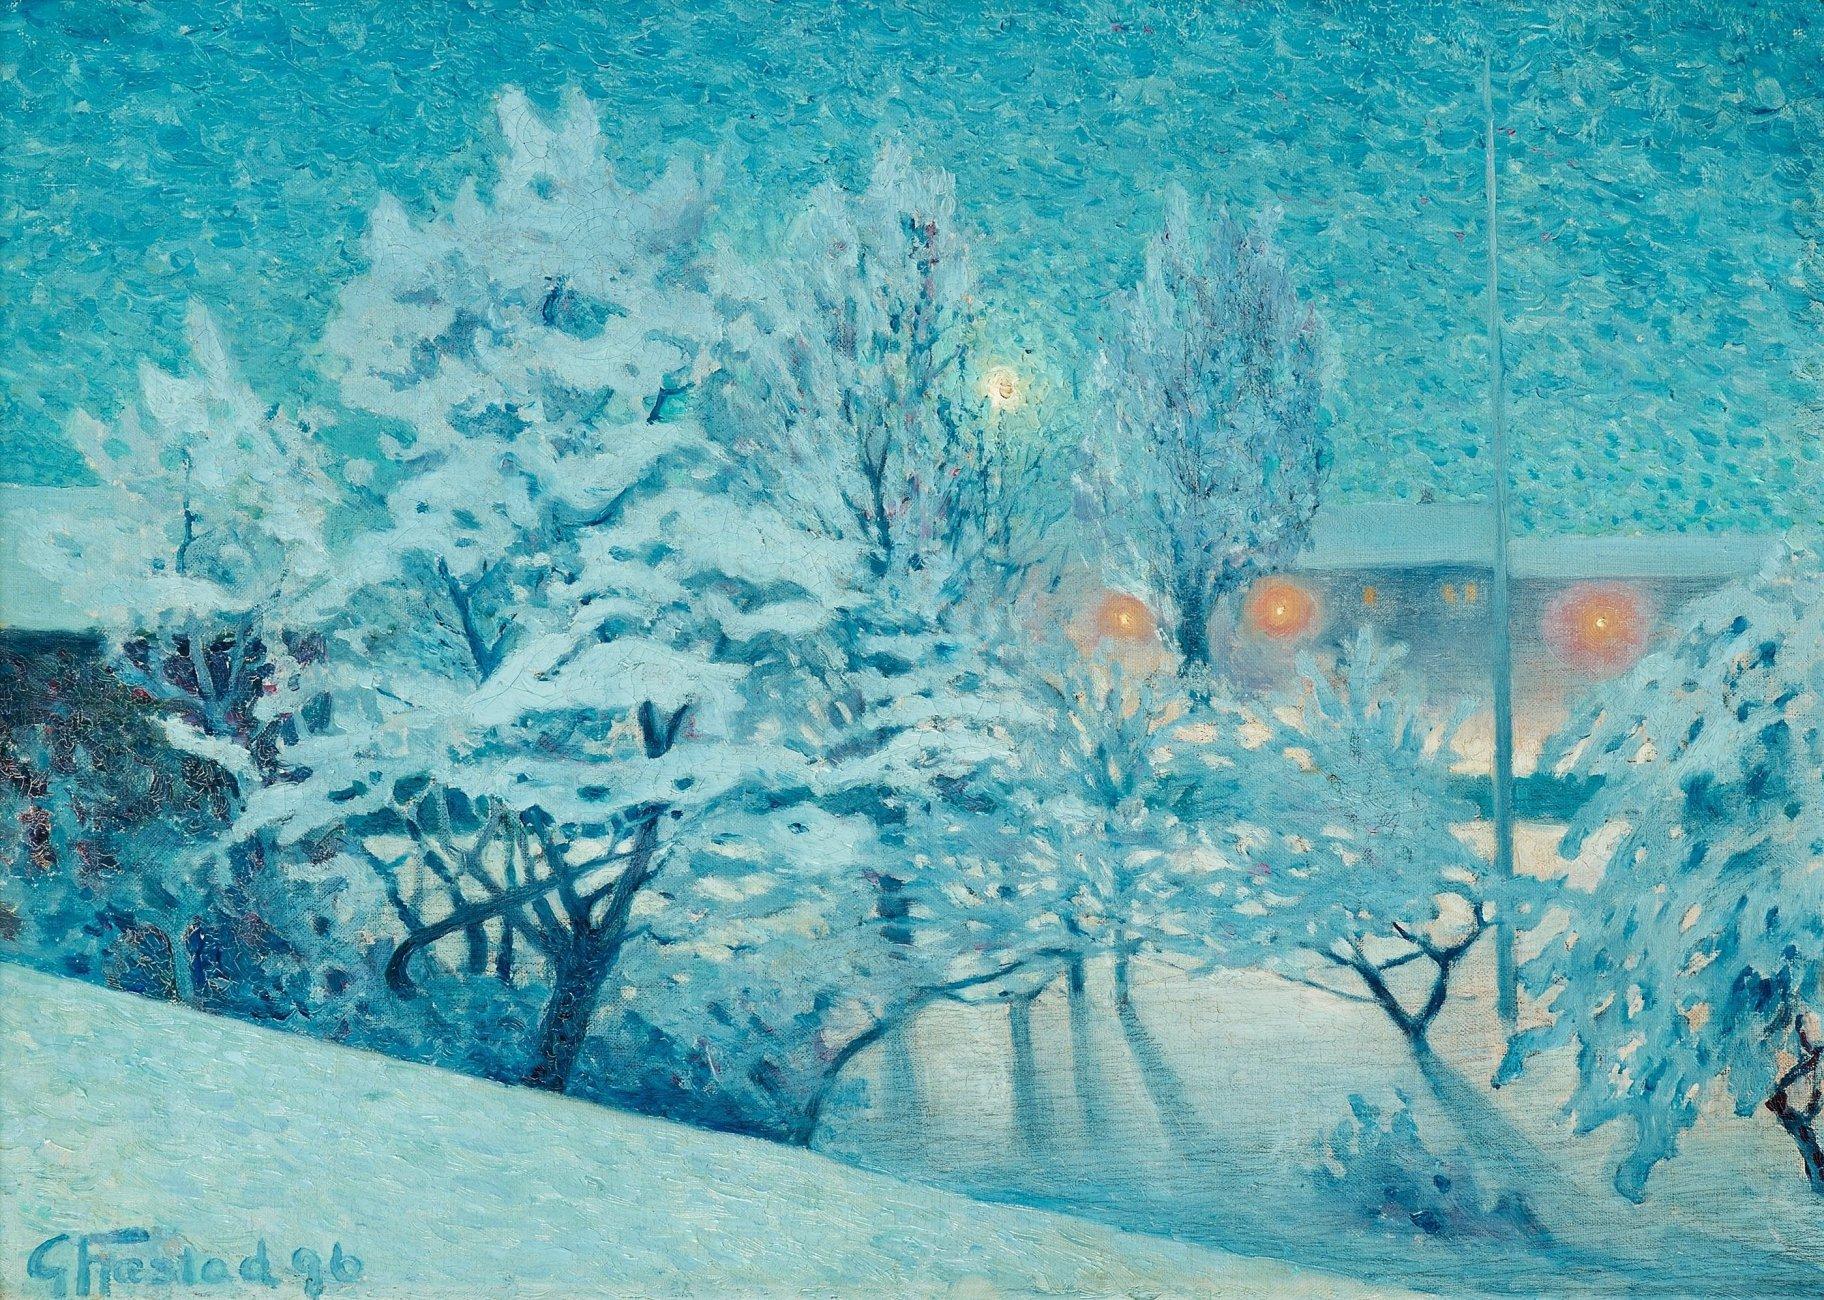 Winter-Landscape-Gustaf-Fjæstad-Oil-Painting-1.jpg